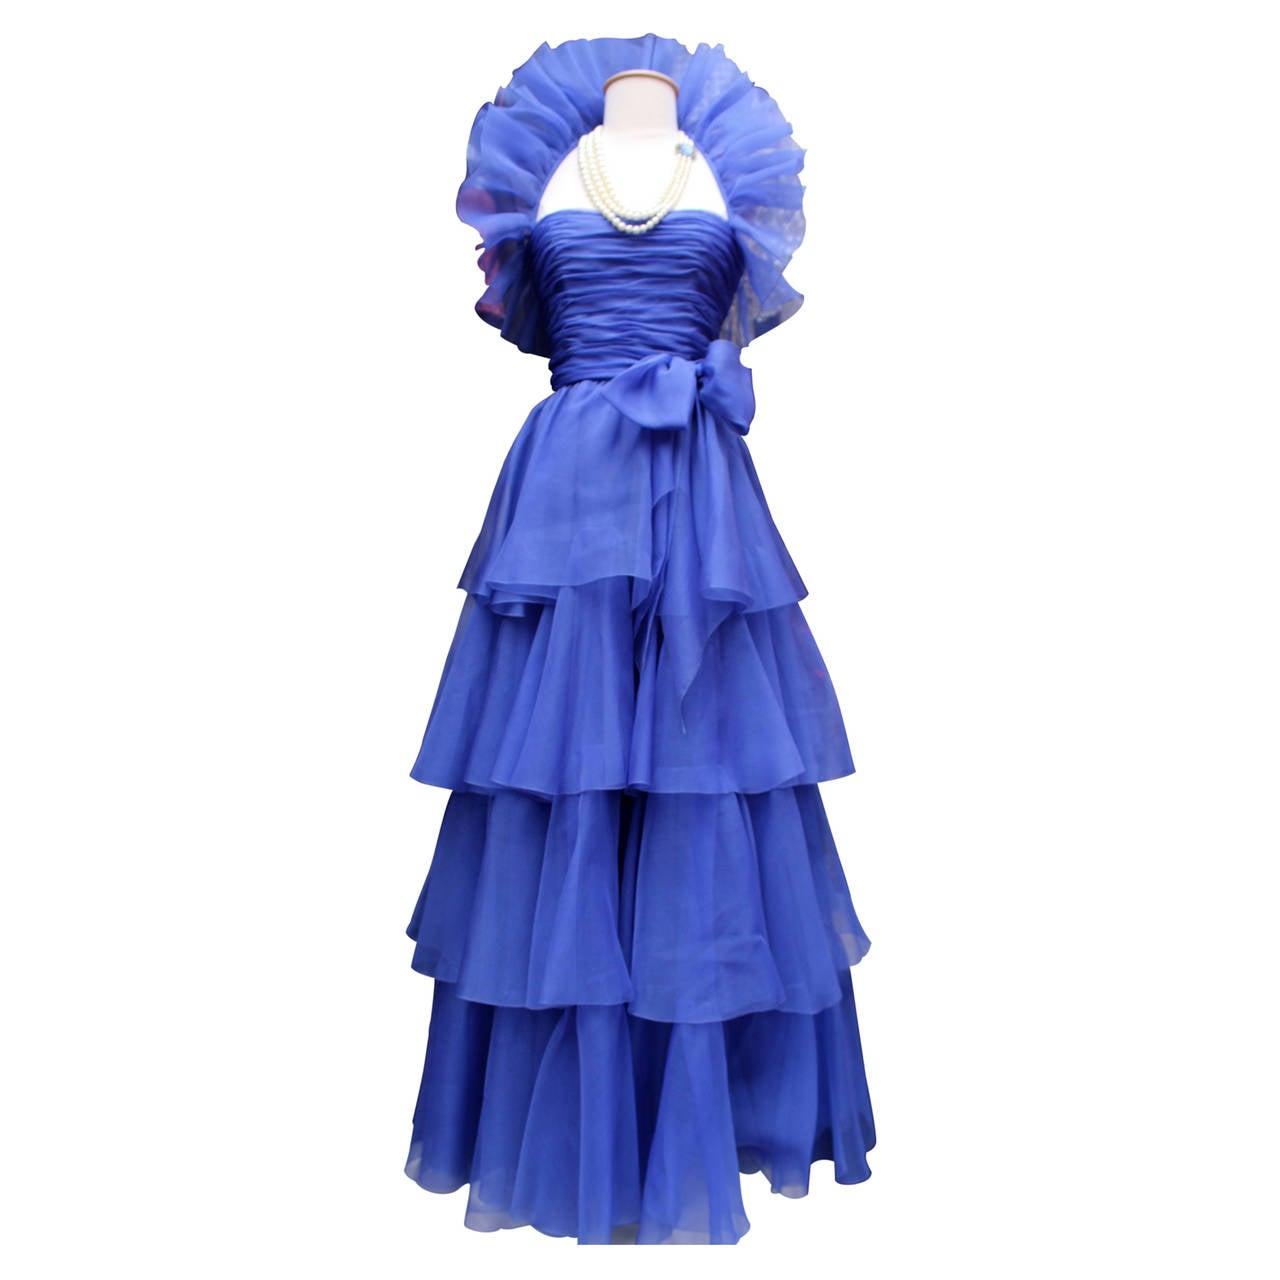 Jean-Louis Scherrer Haute Couture Blue Organza Evening Gown, 1980s  For Sale